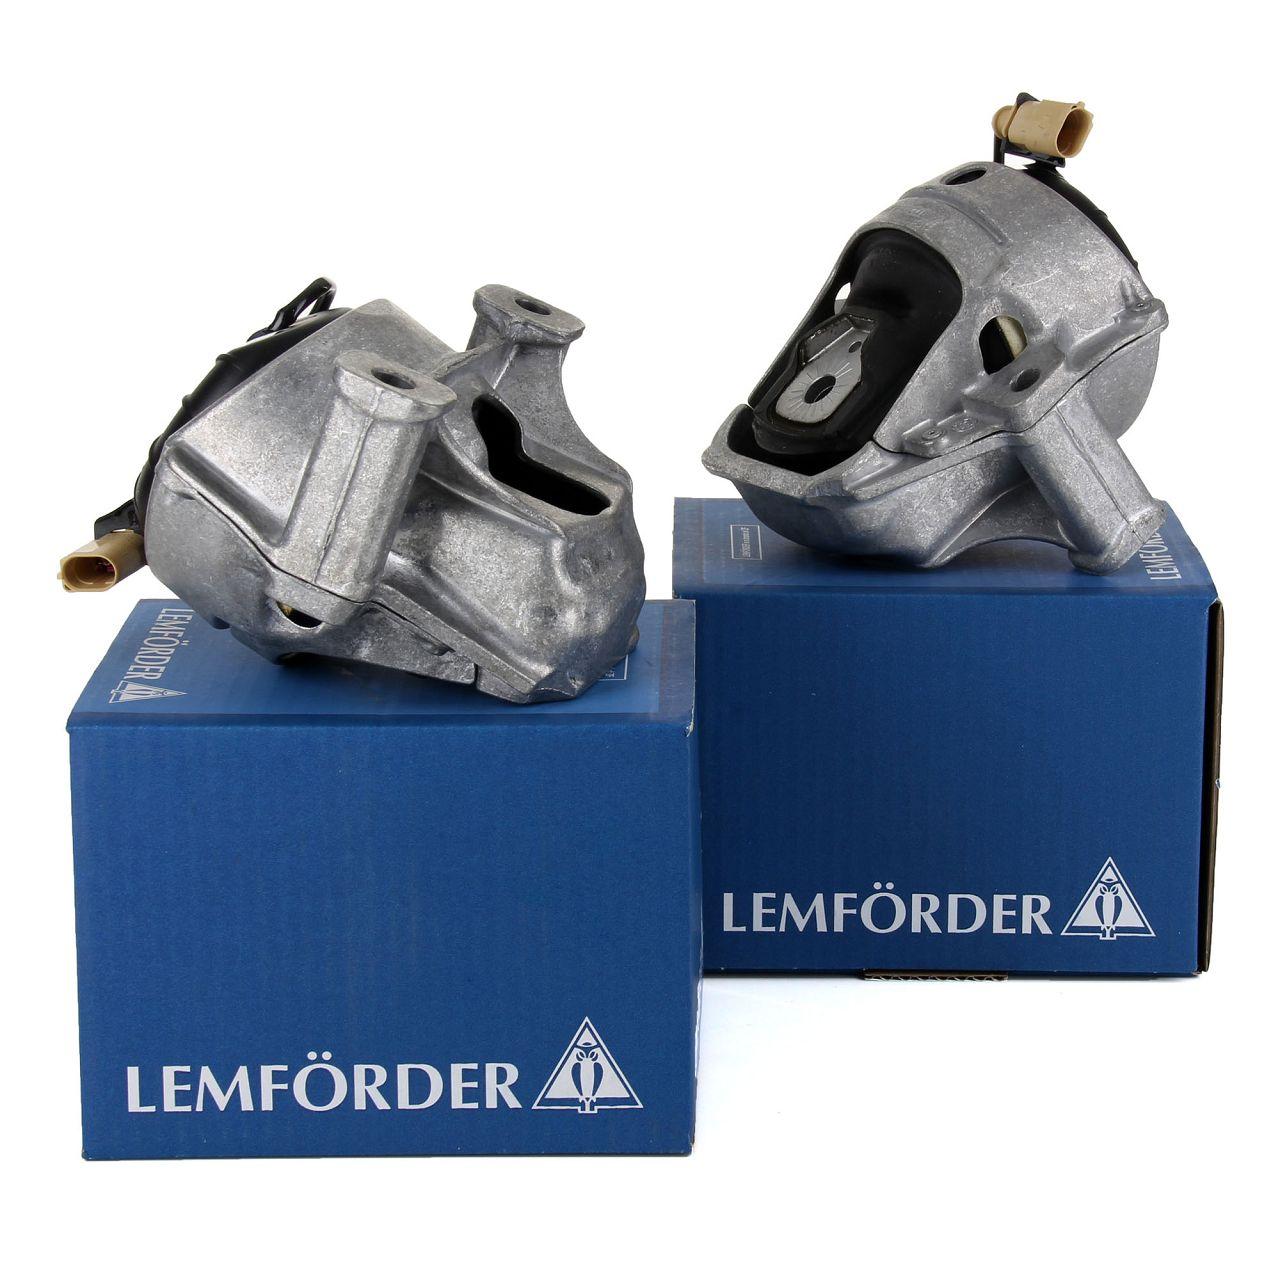 2x LEMFÖRDER Motorlager AUDI A4 B8 A5 8T 8F Q5 8RB 2.7/3.0 TDI links + rechts